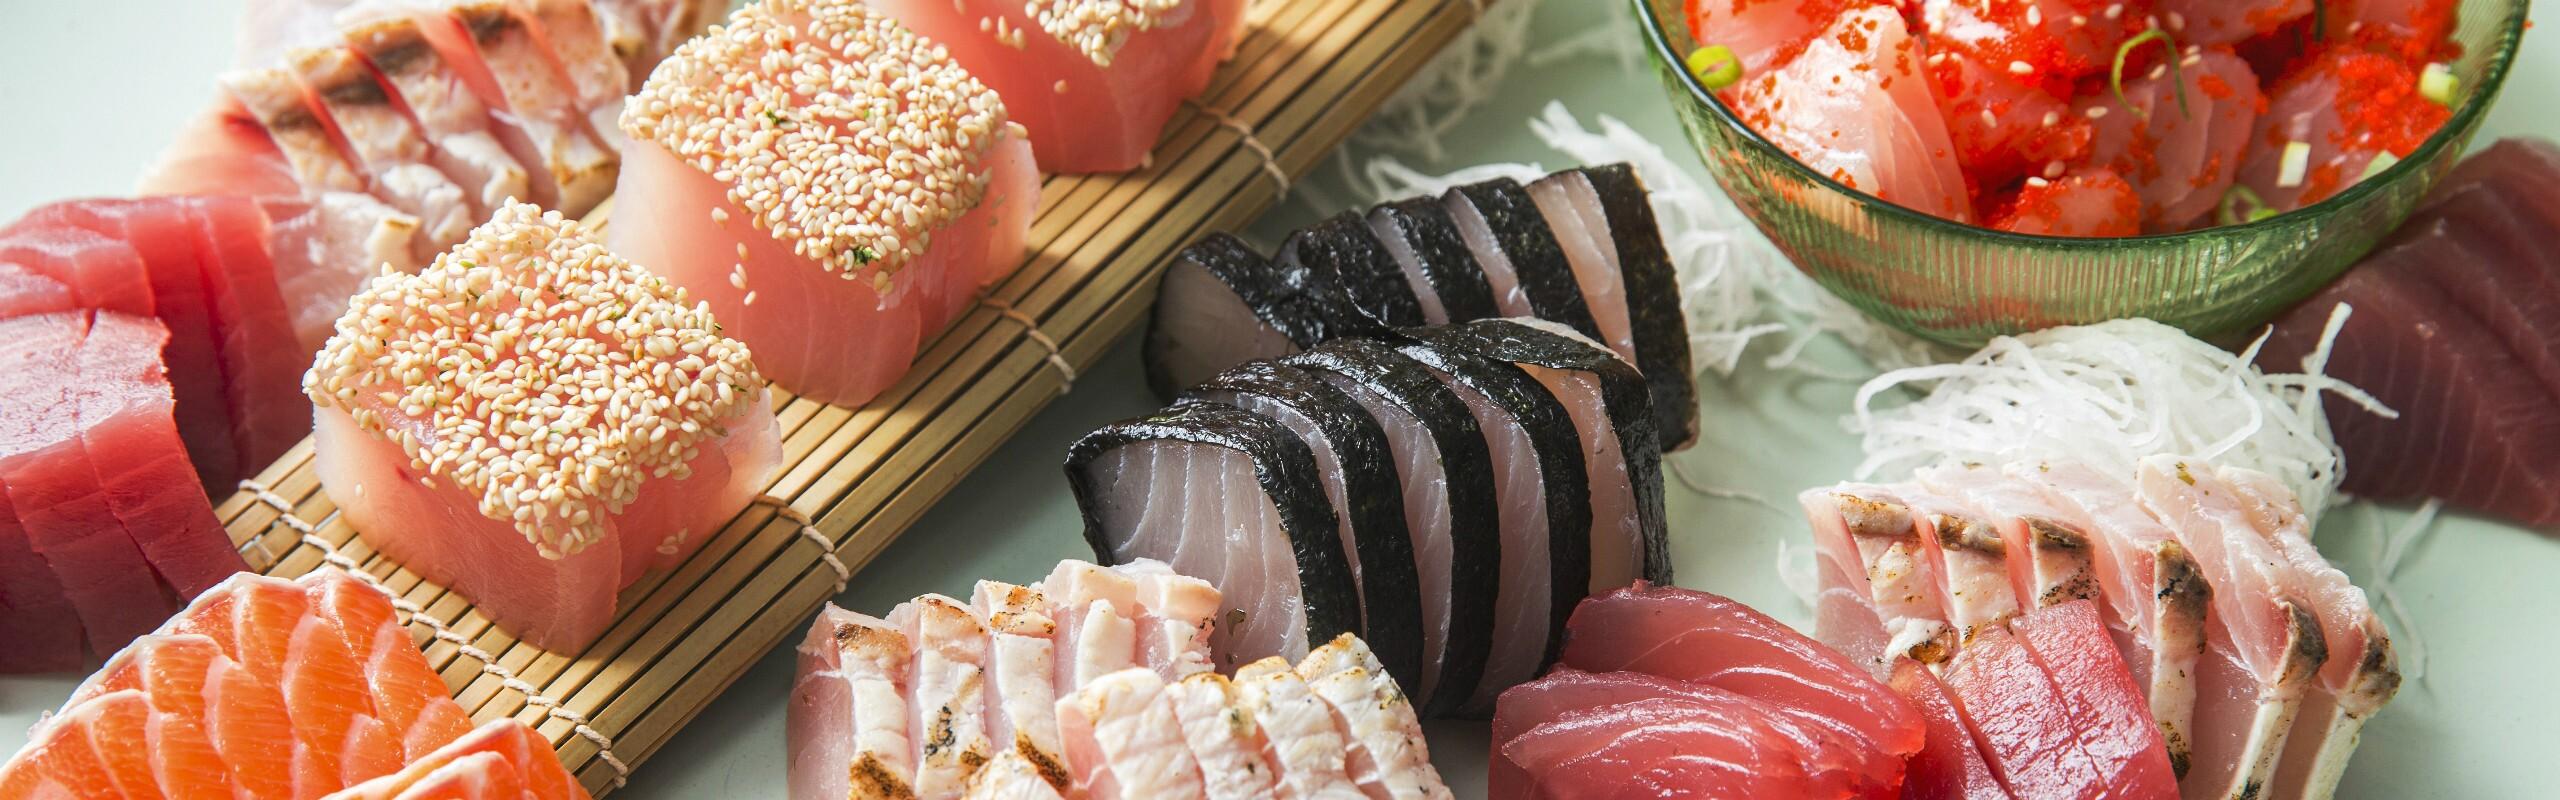 Tsukiji Market Guide - Is the Market Still Open?